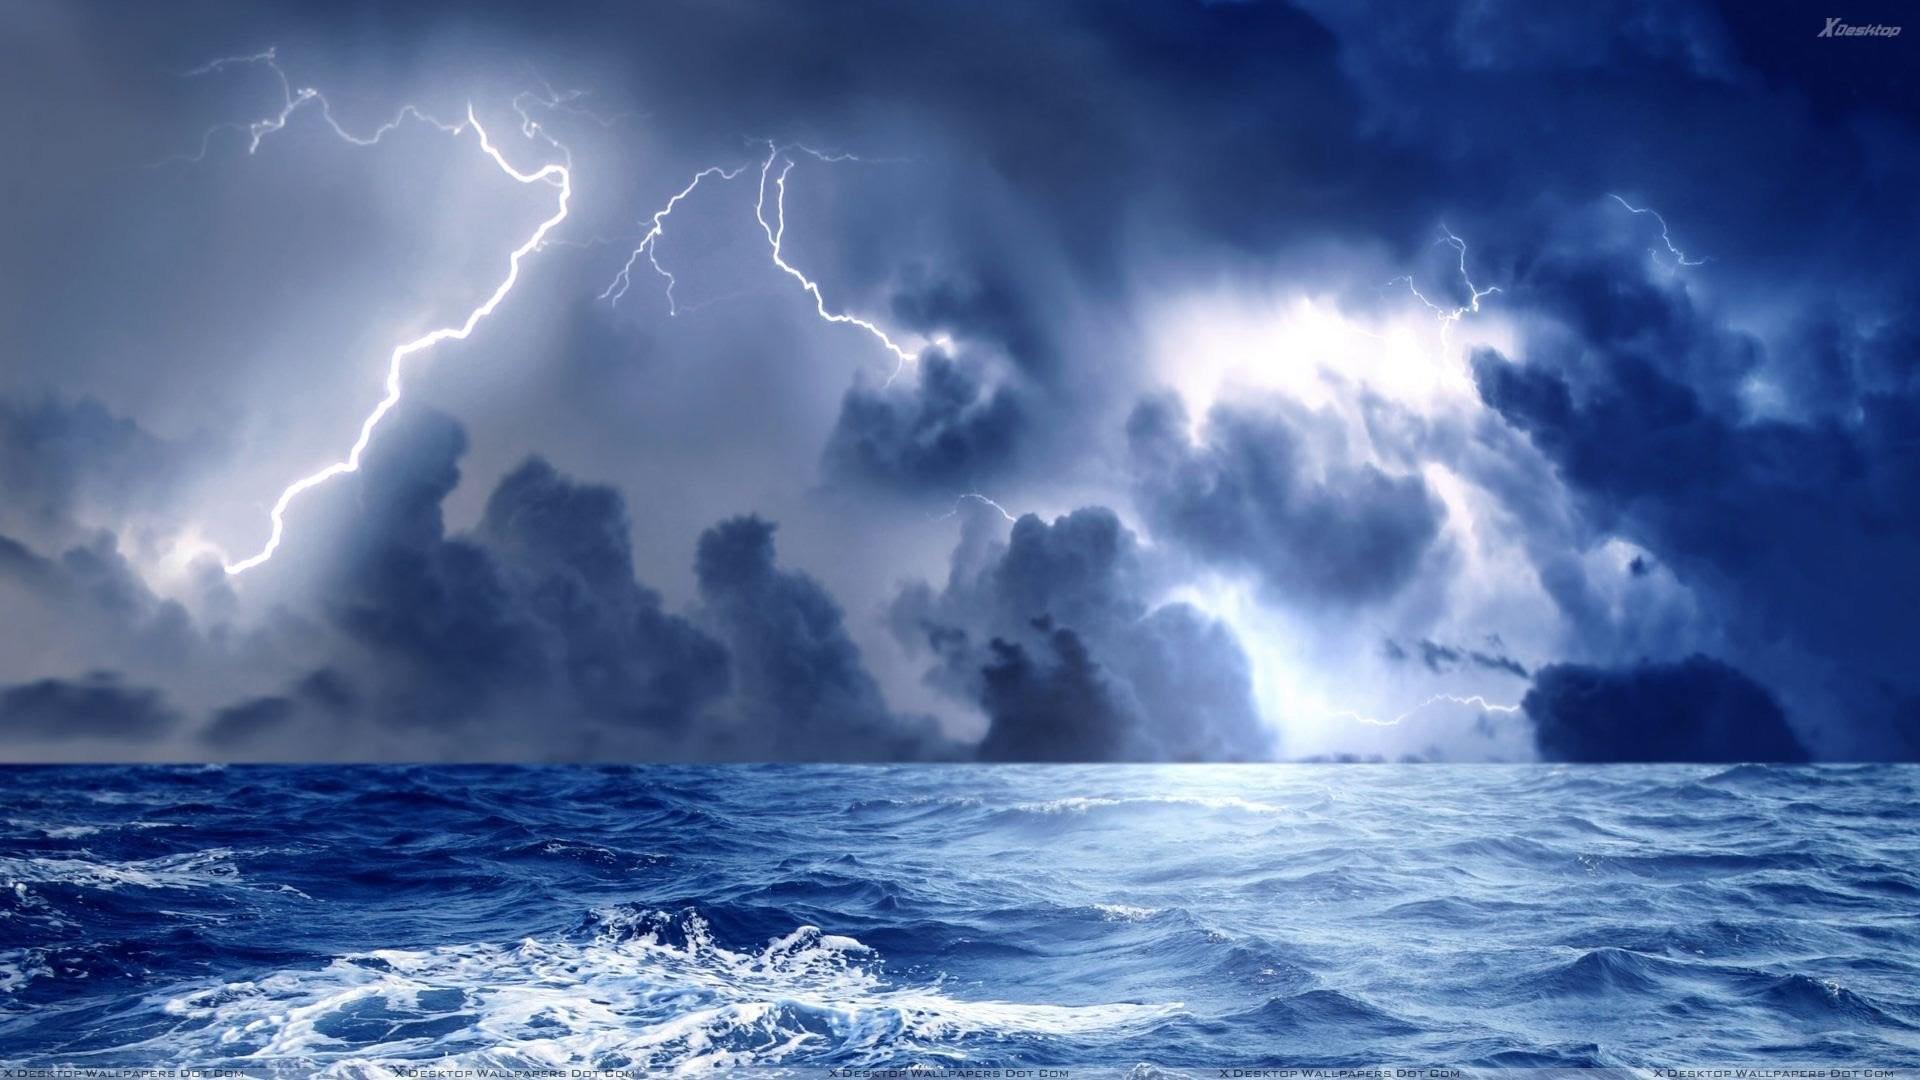 STORM weather rain sky clouds nature ocean sea lightning wallpaper |  | 838280 | WallpaperUP